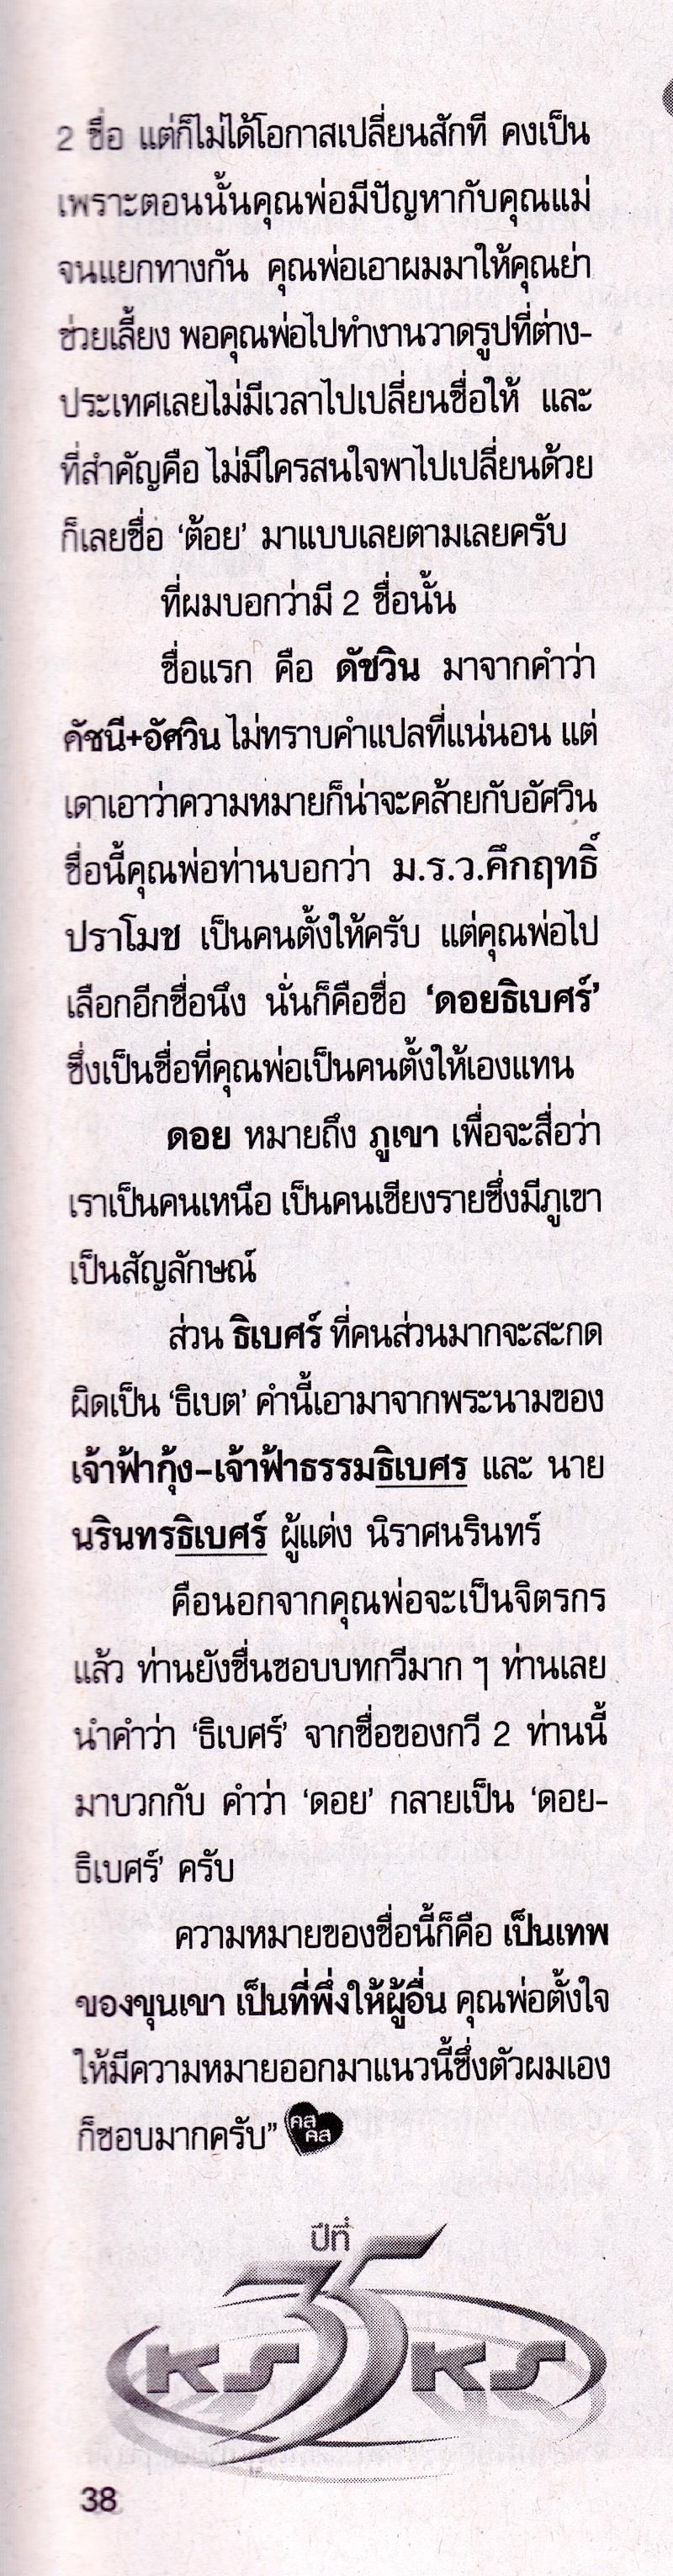 TW-คสคส.8